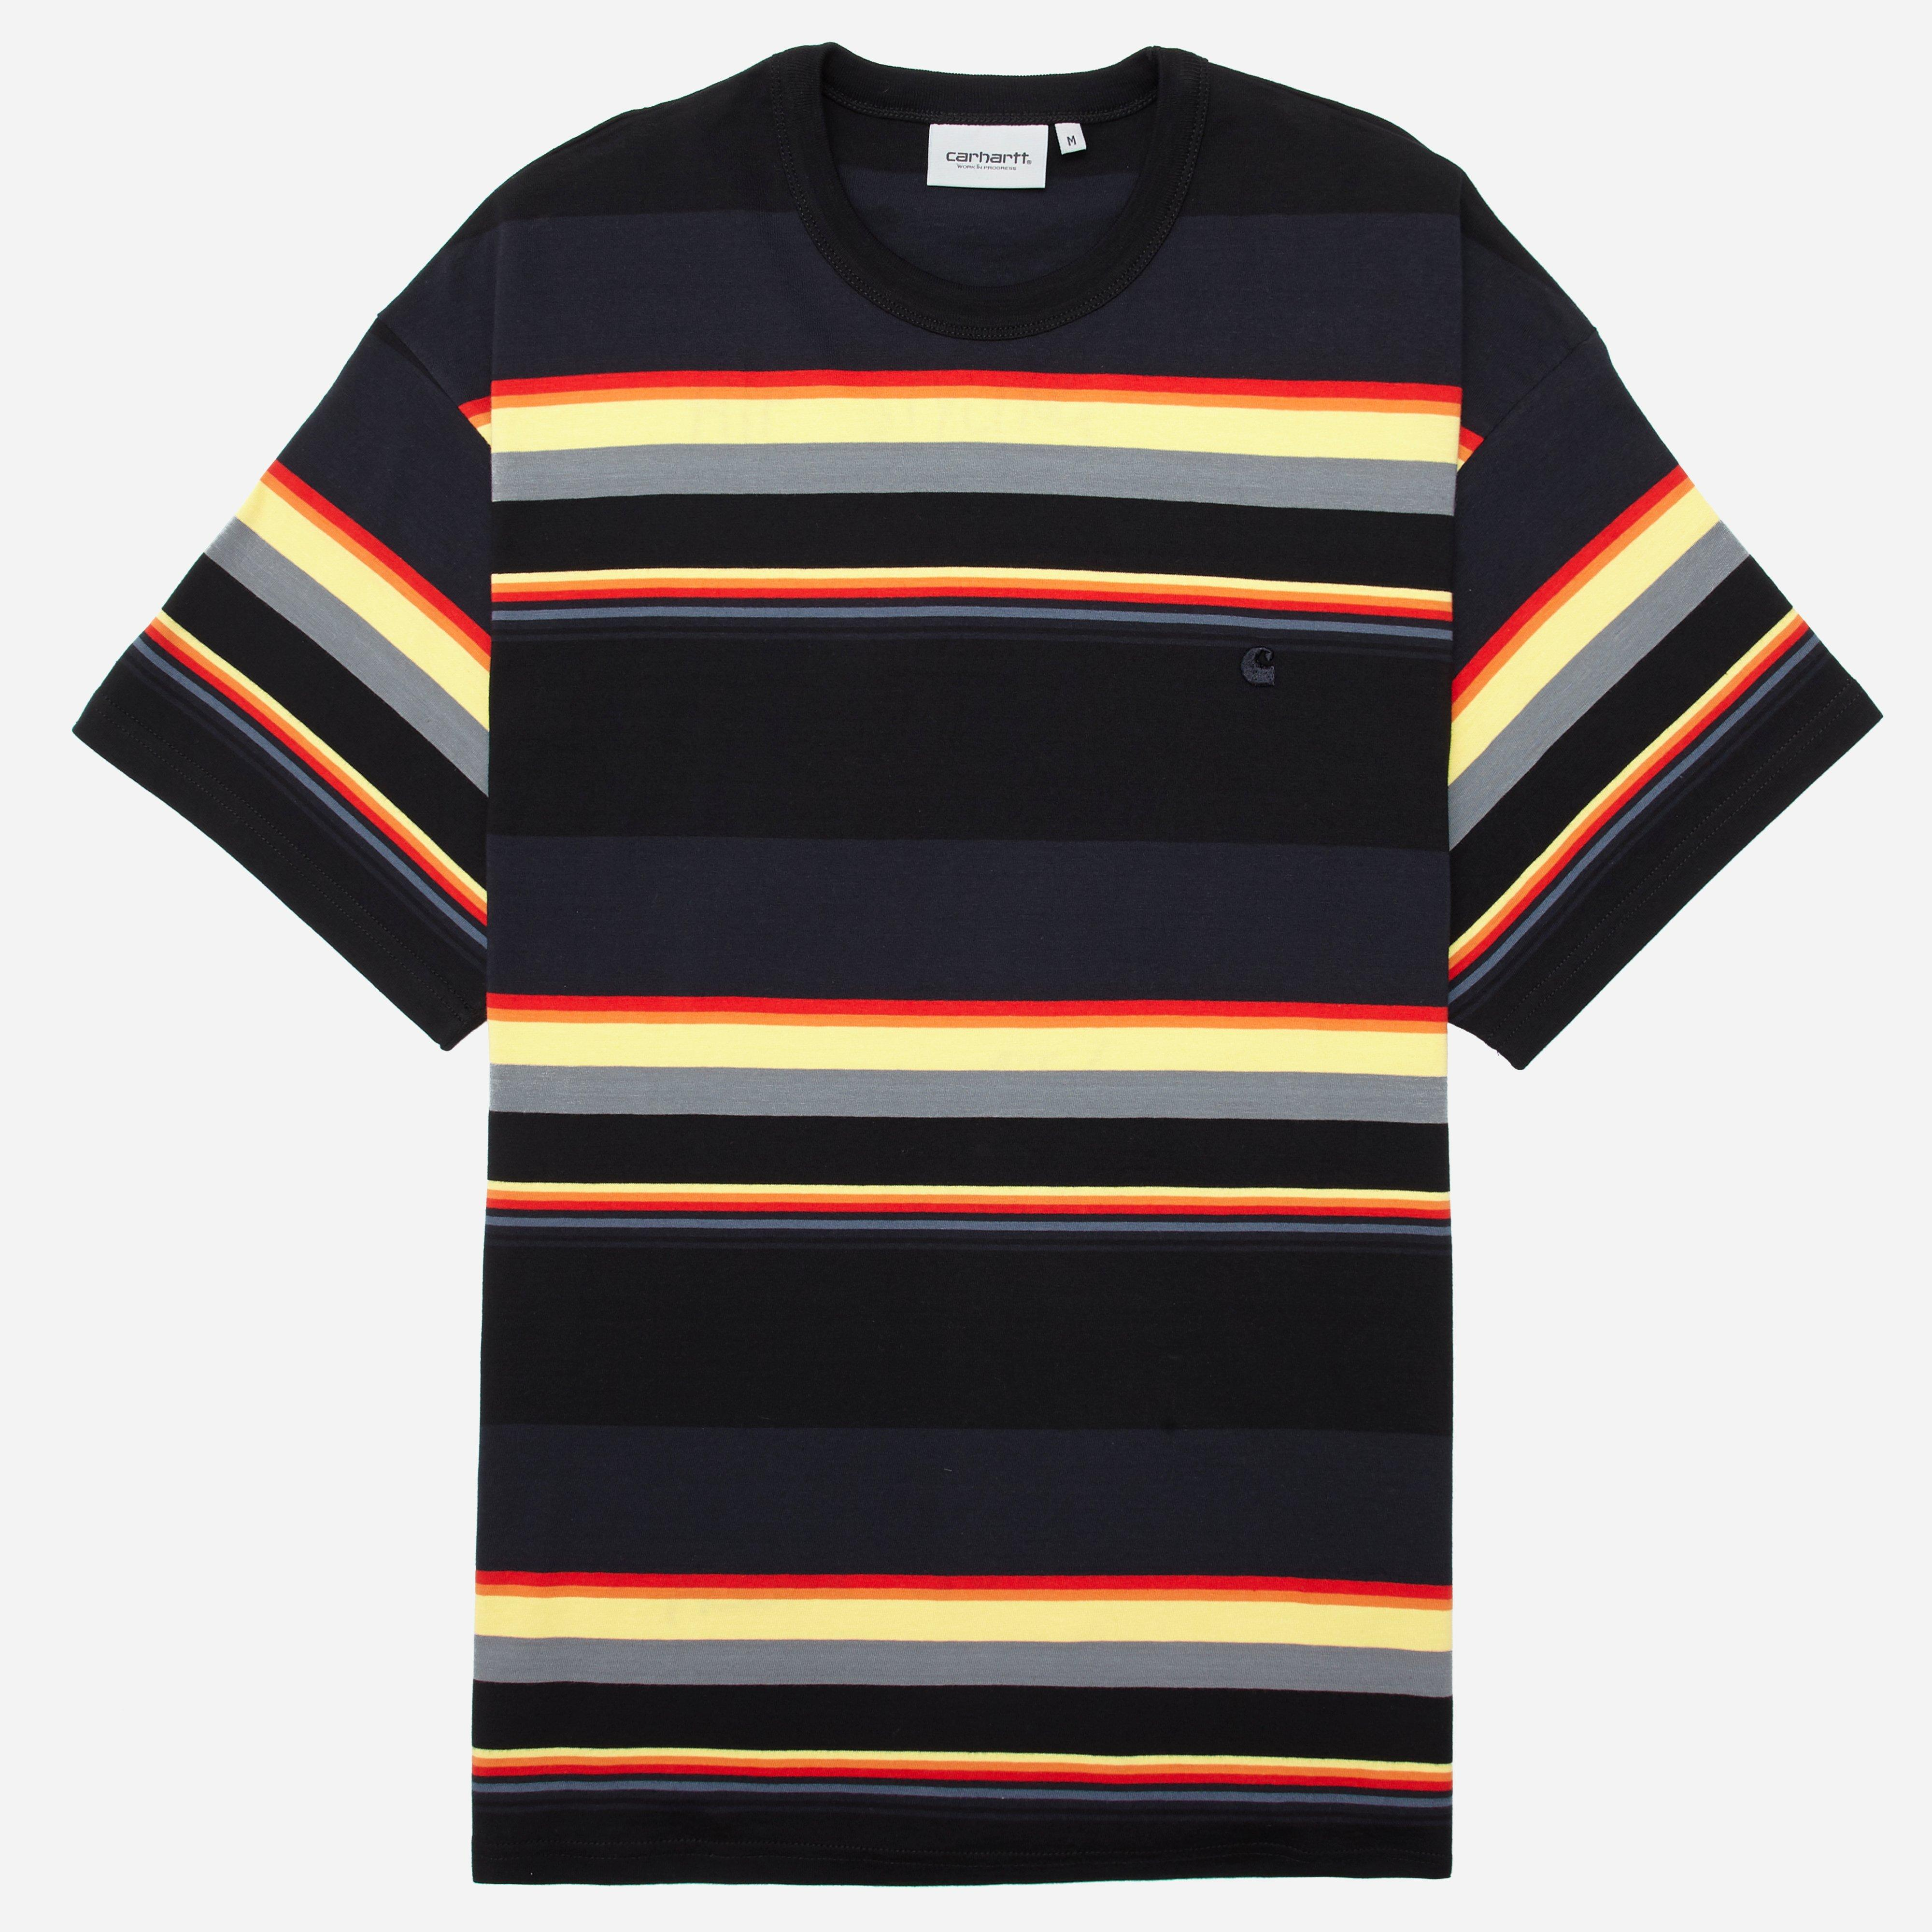 Carhartt WIP Sunder T-shirt